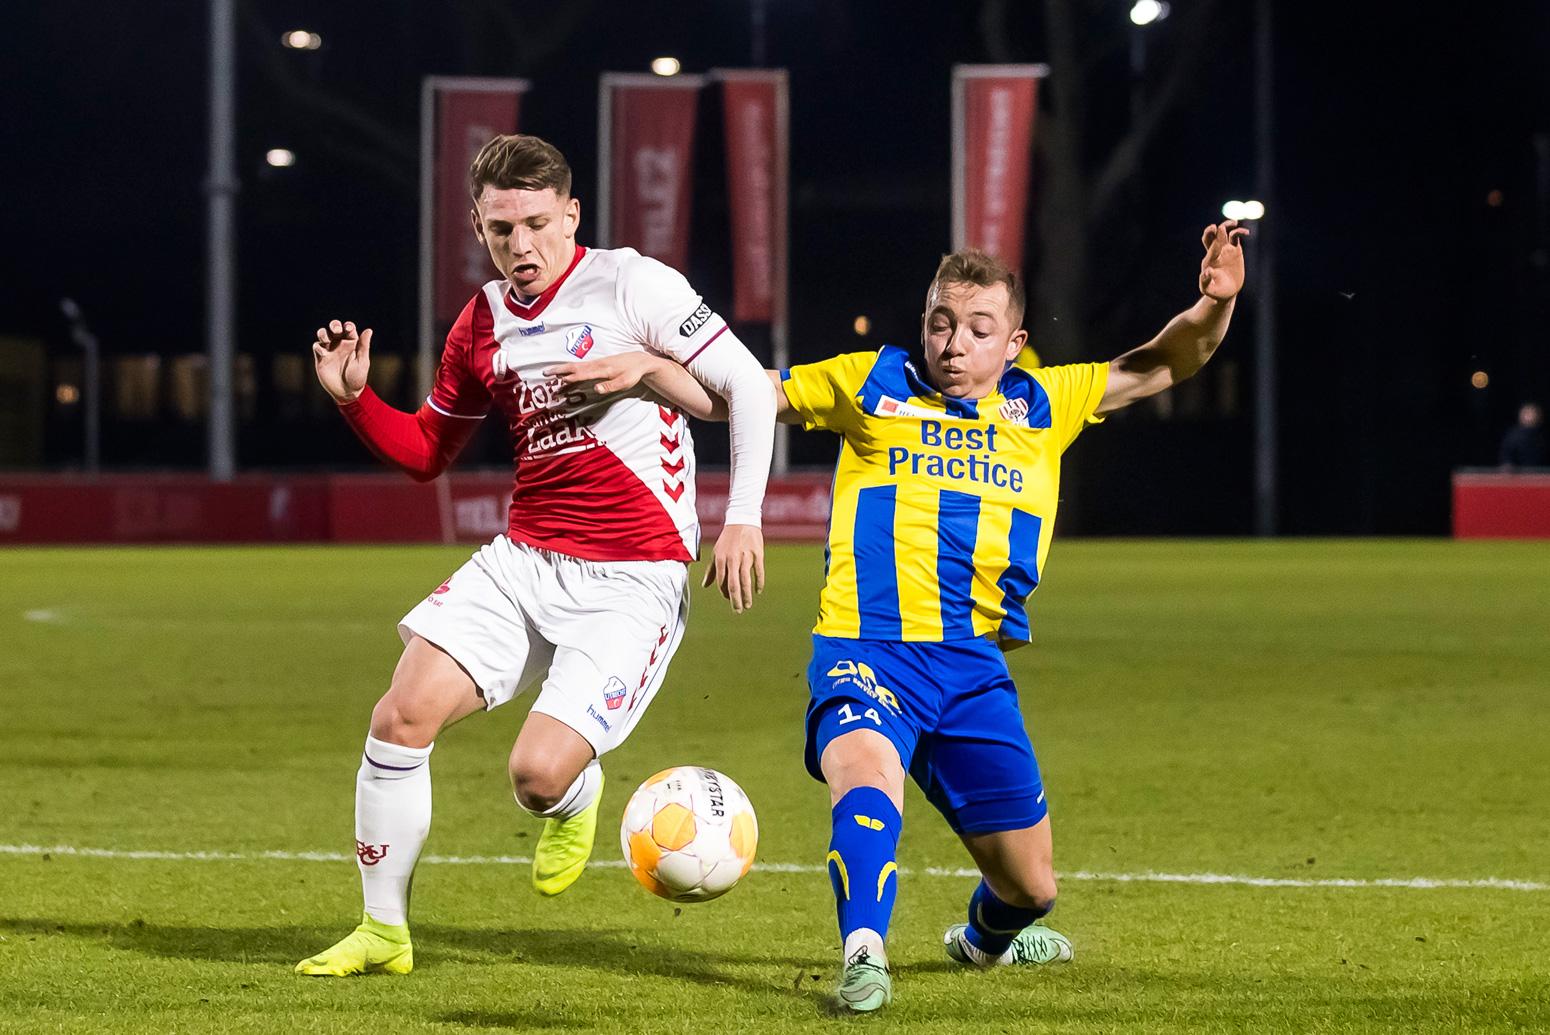 Voorbeschouwing Jong FC Utrecht – TOP Oss